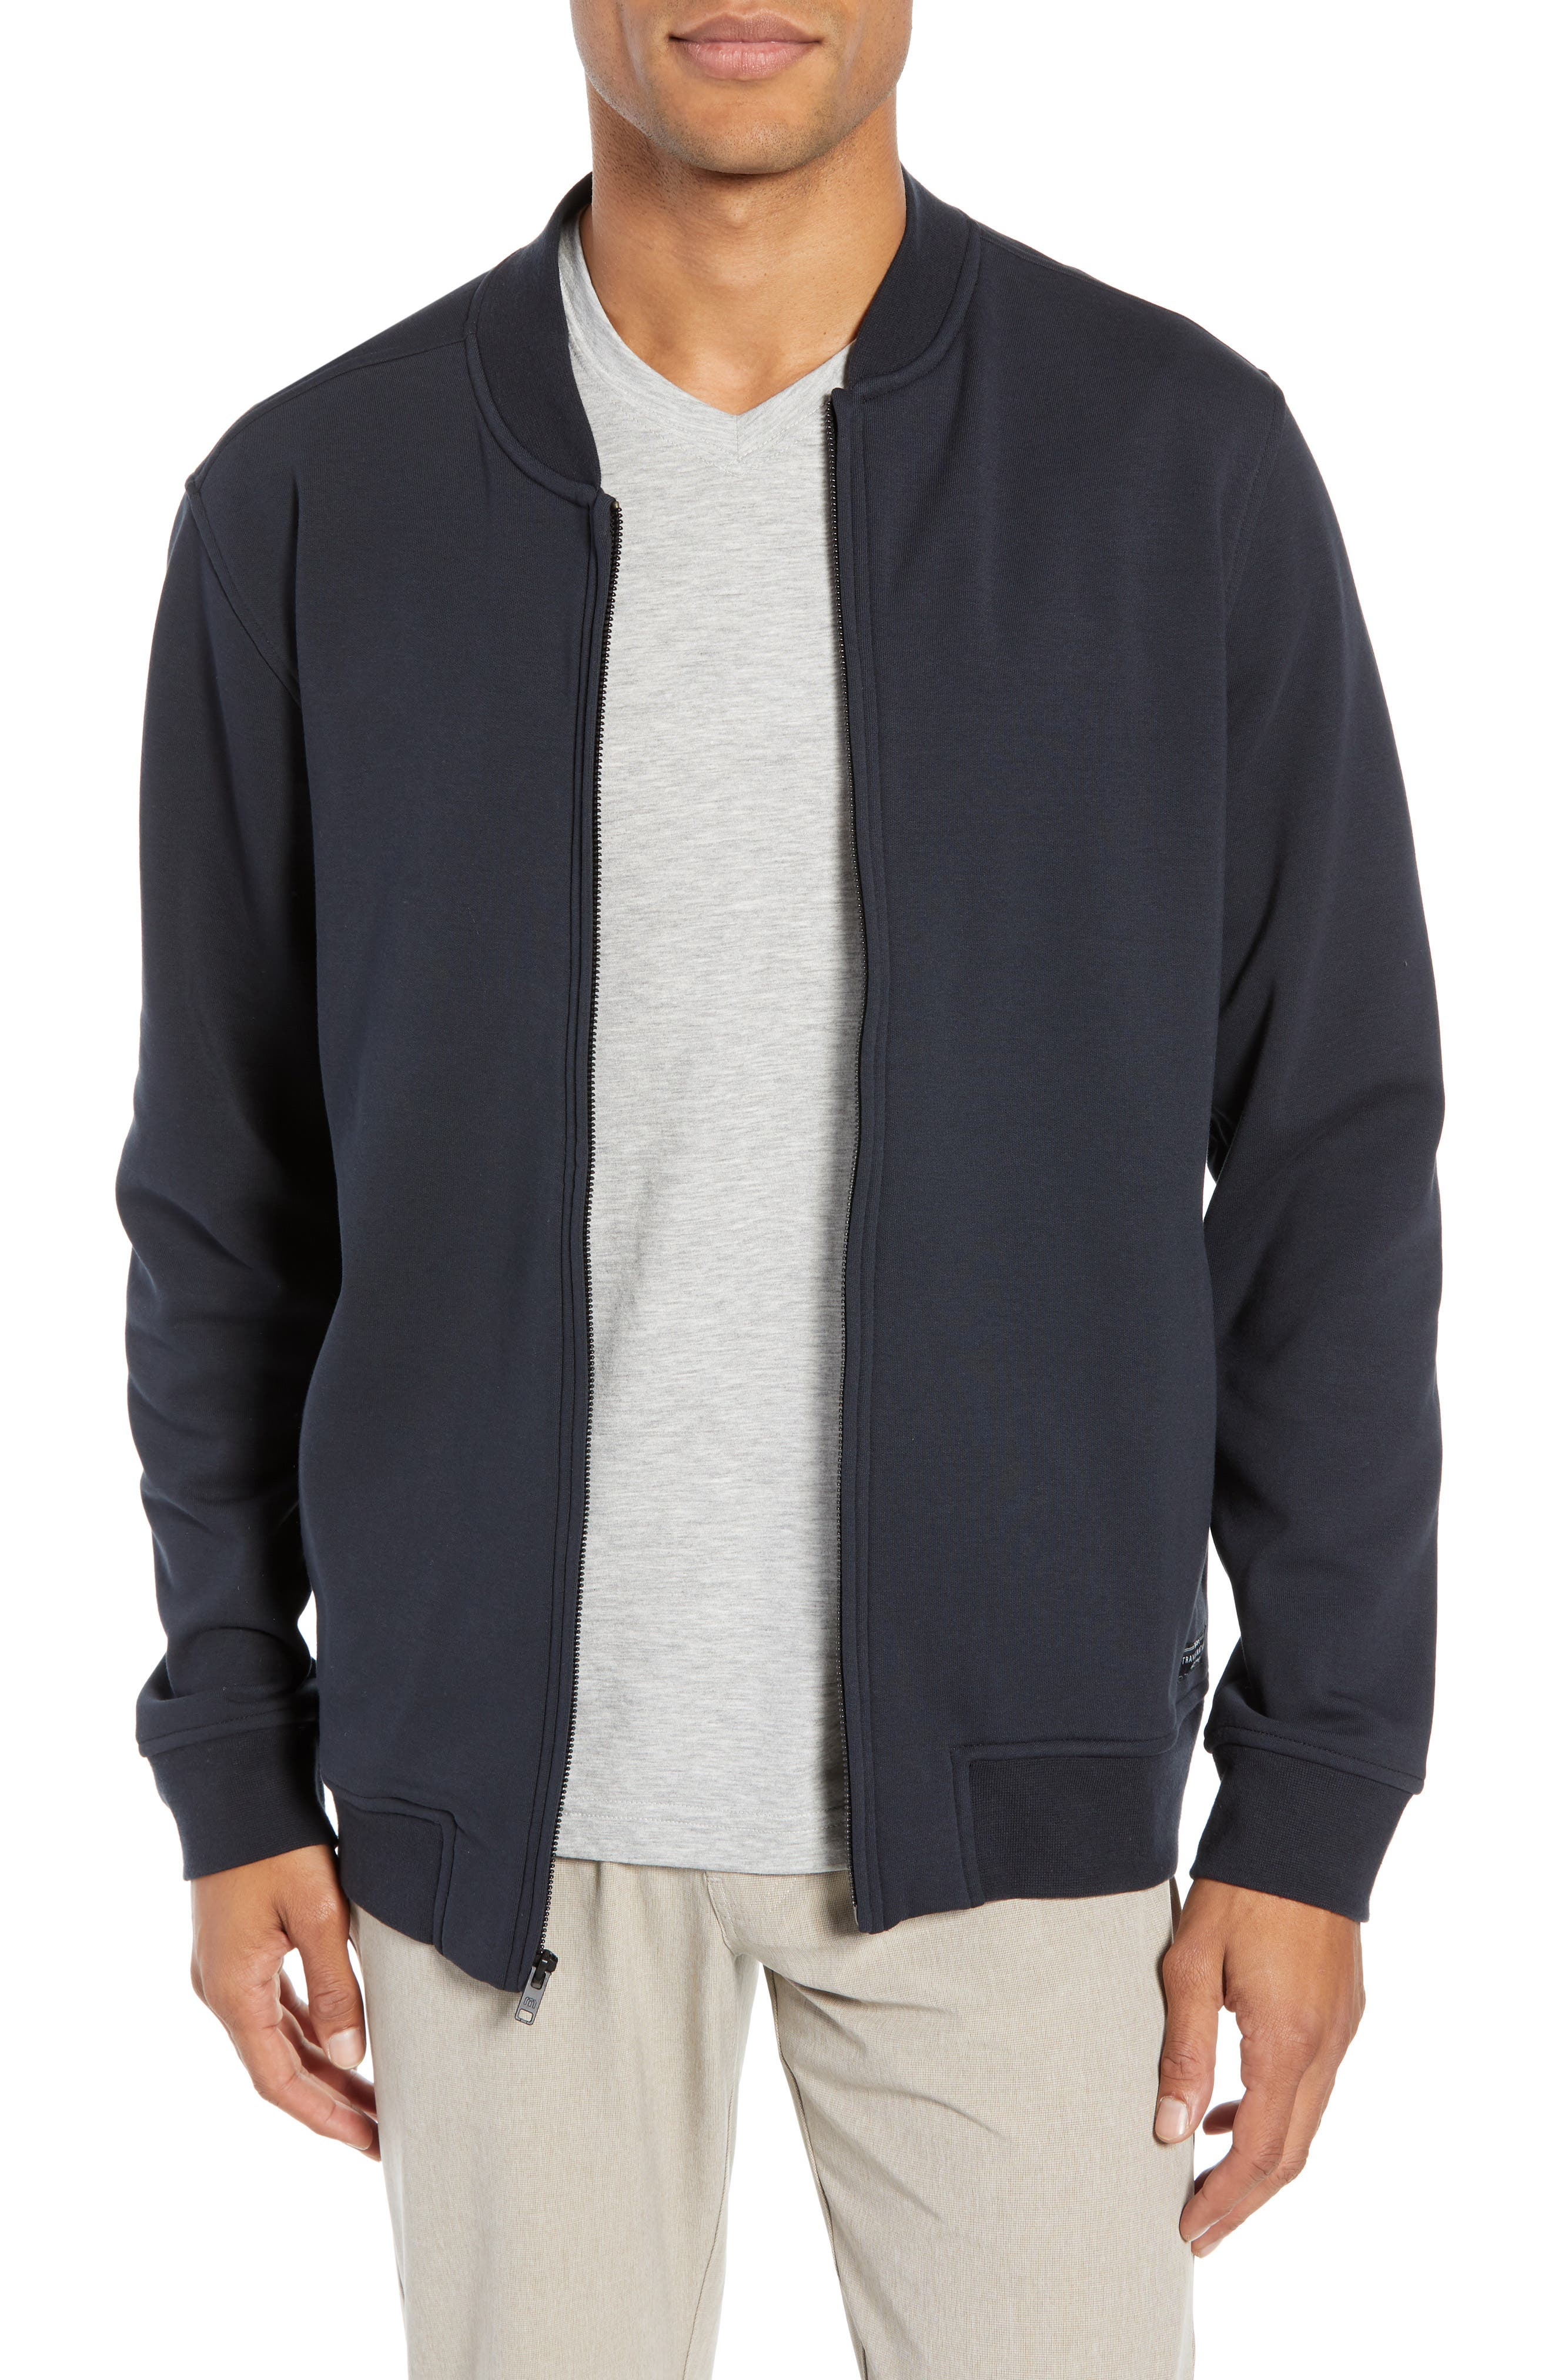 Cavalry Knit Bomber Jacket, Main, color, BLACK